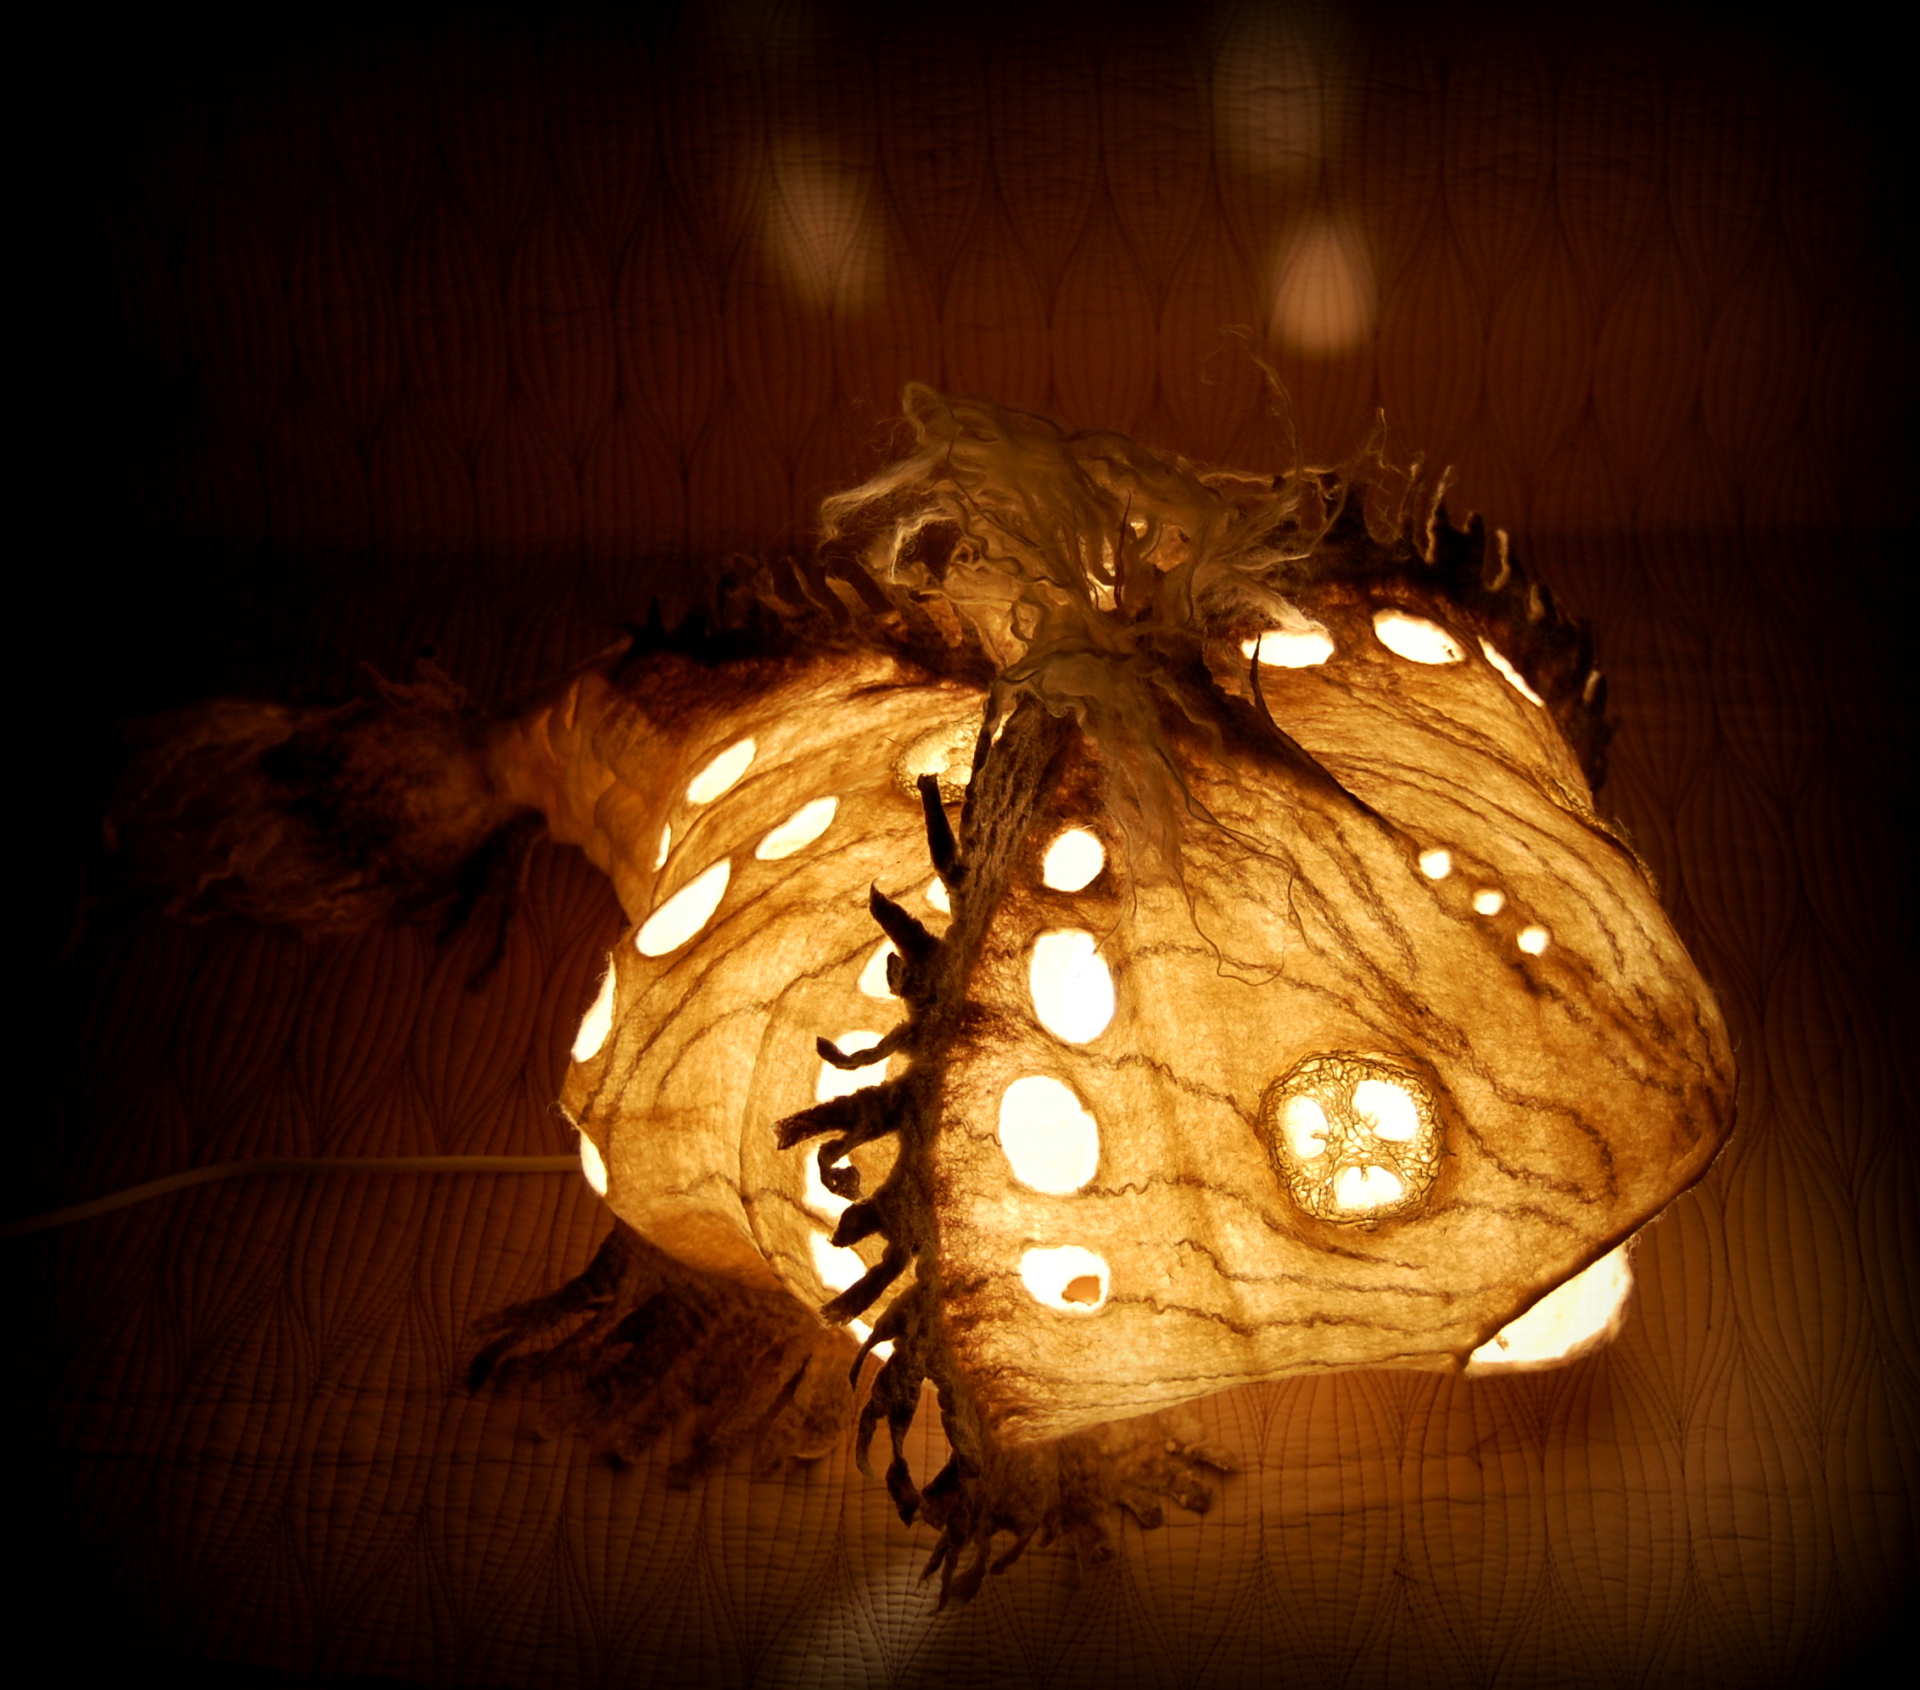 Felting, wool, merino, felt art, lamp, OOAK, валяние, светильник из шерсти, светильник из войлока, лампа из войлока, мокрое валяние